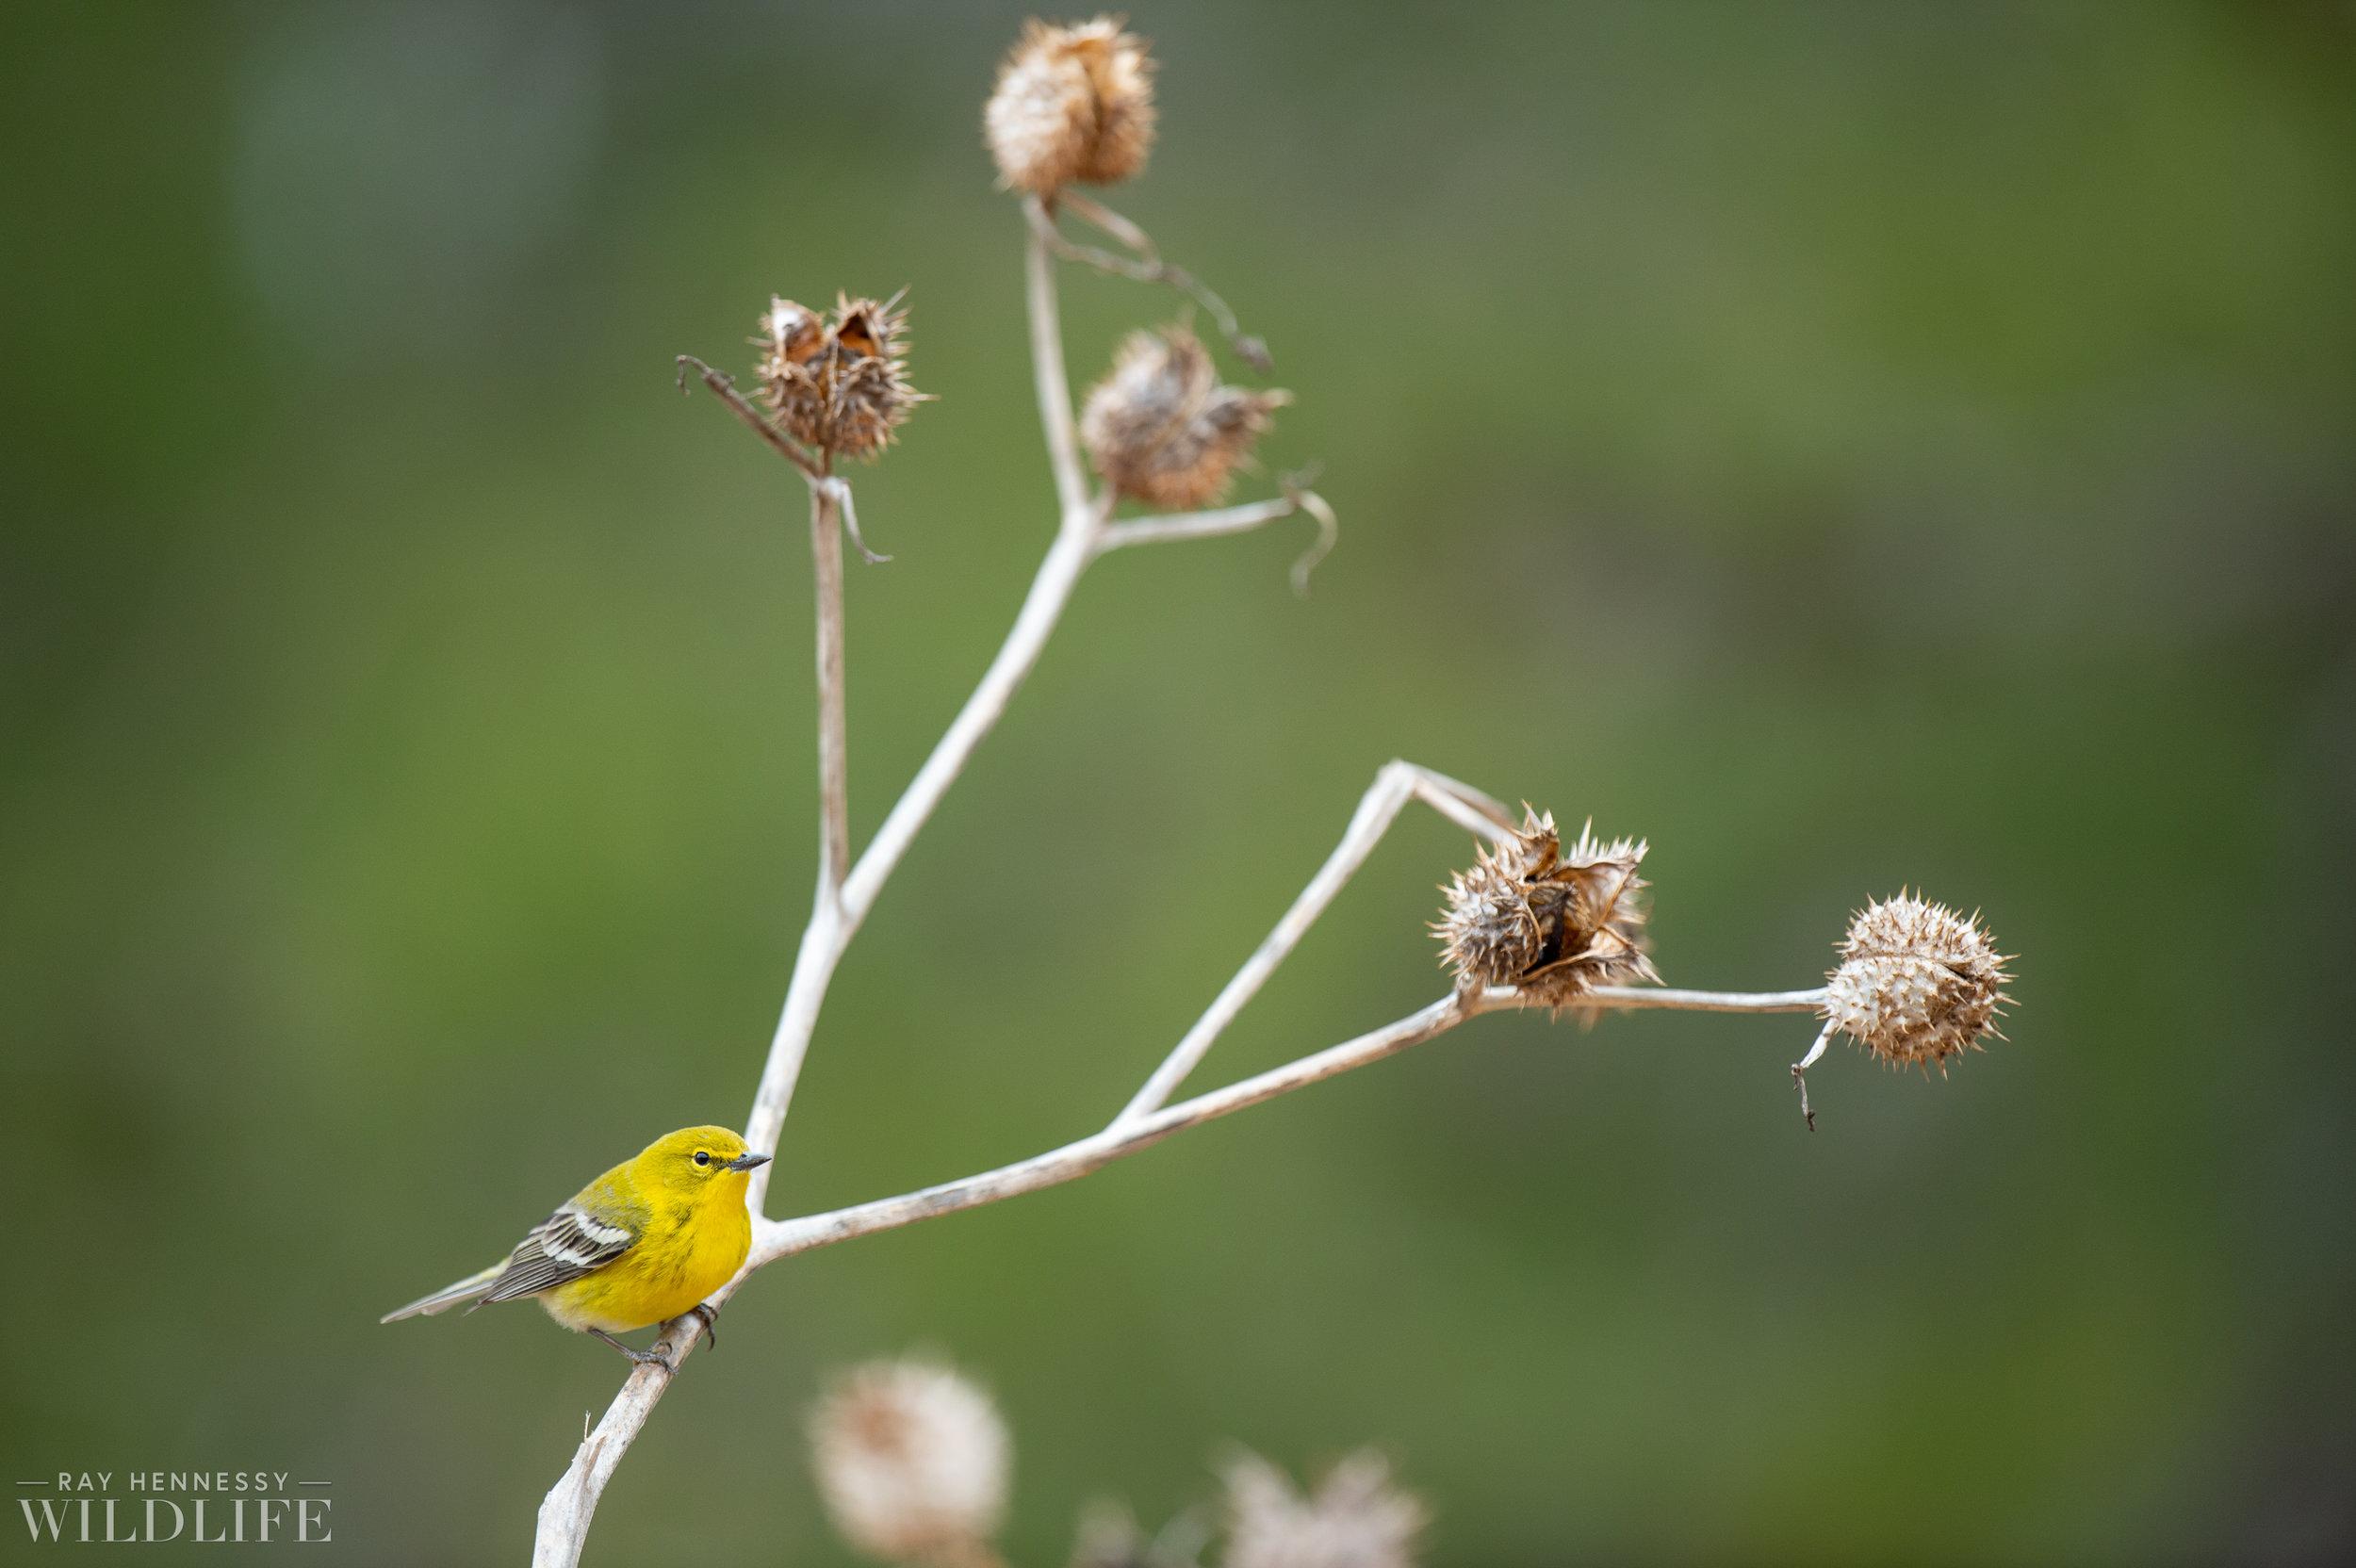 004_pine-warbler.jpg